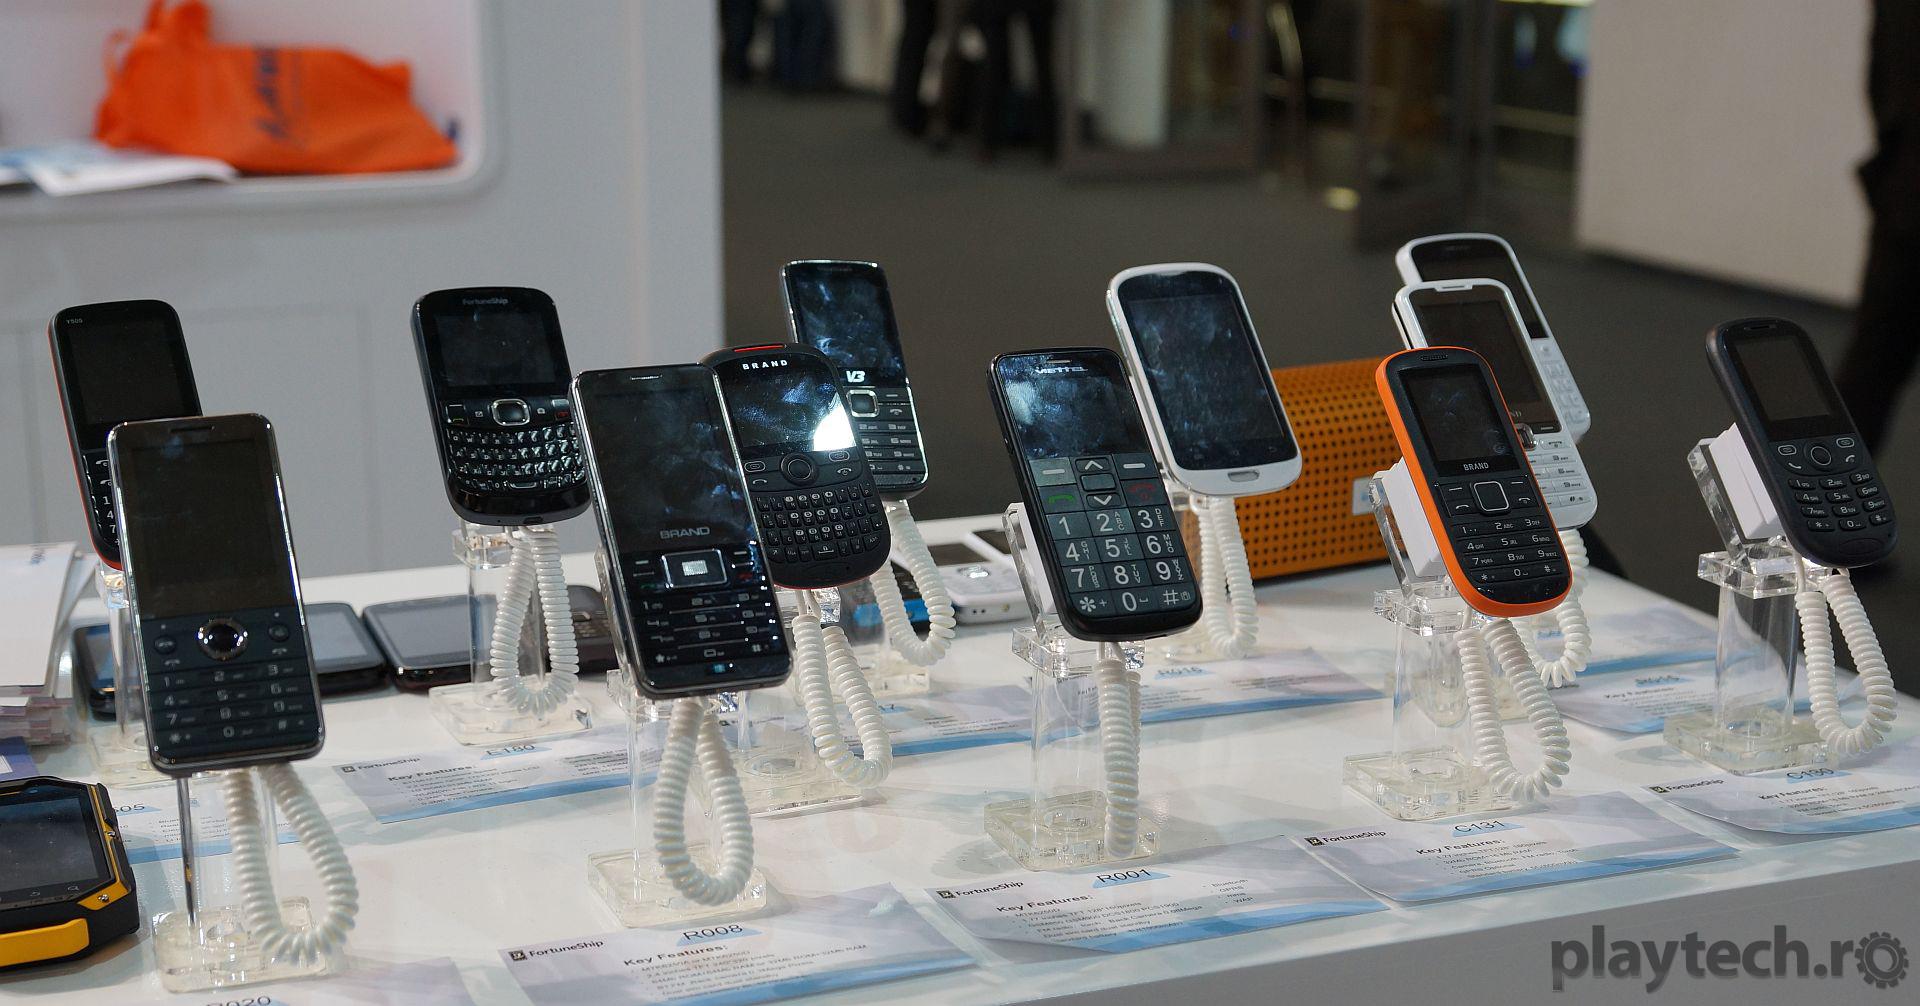 Smartphone China Copie BalckBerry Samsung Sony Nokia